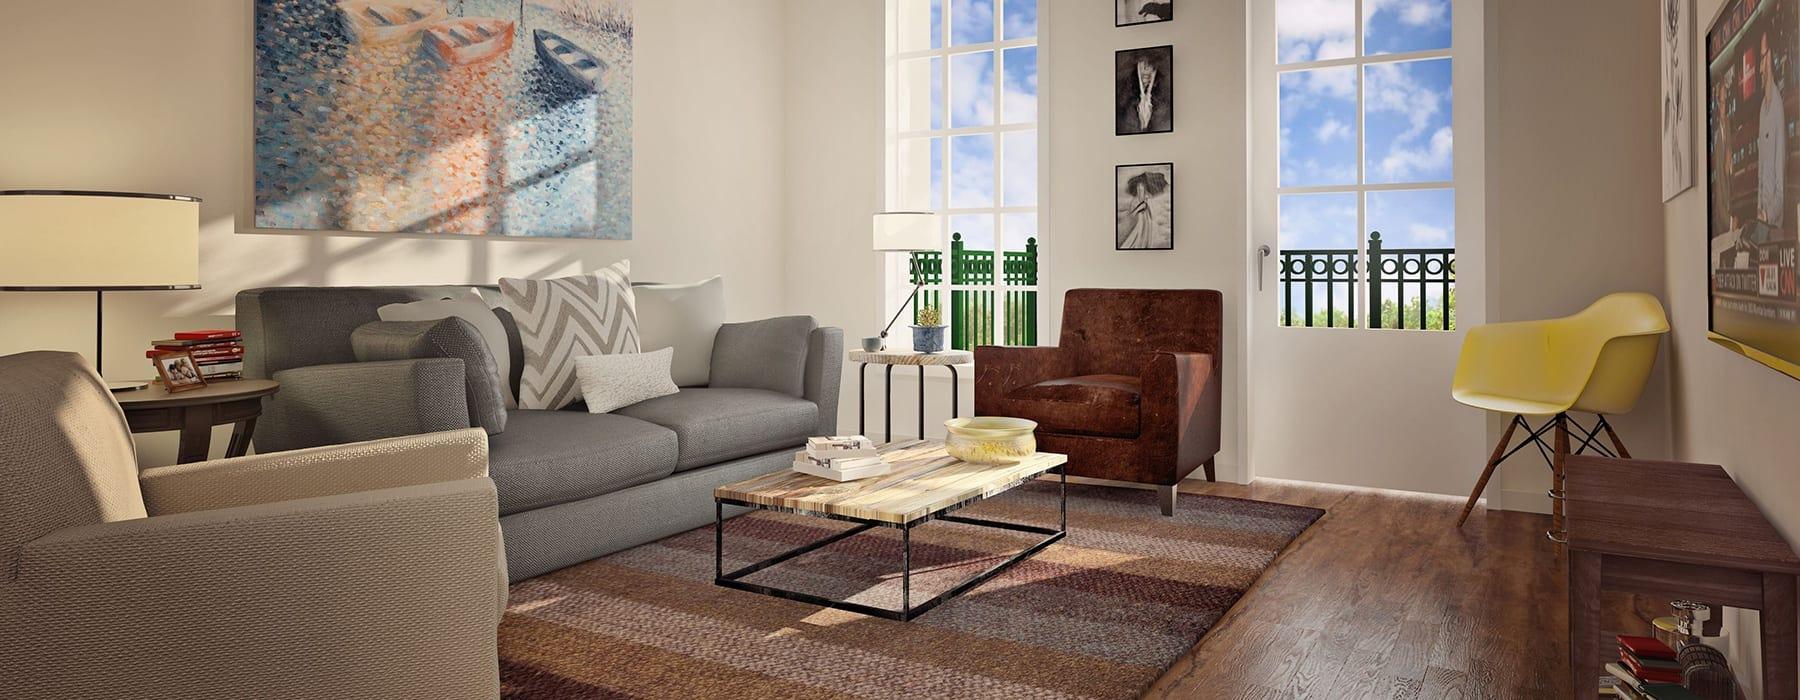 rendering of spacious living area